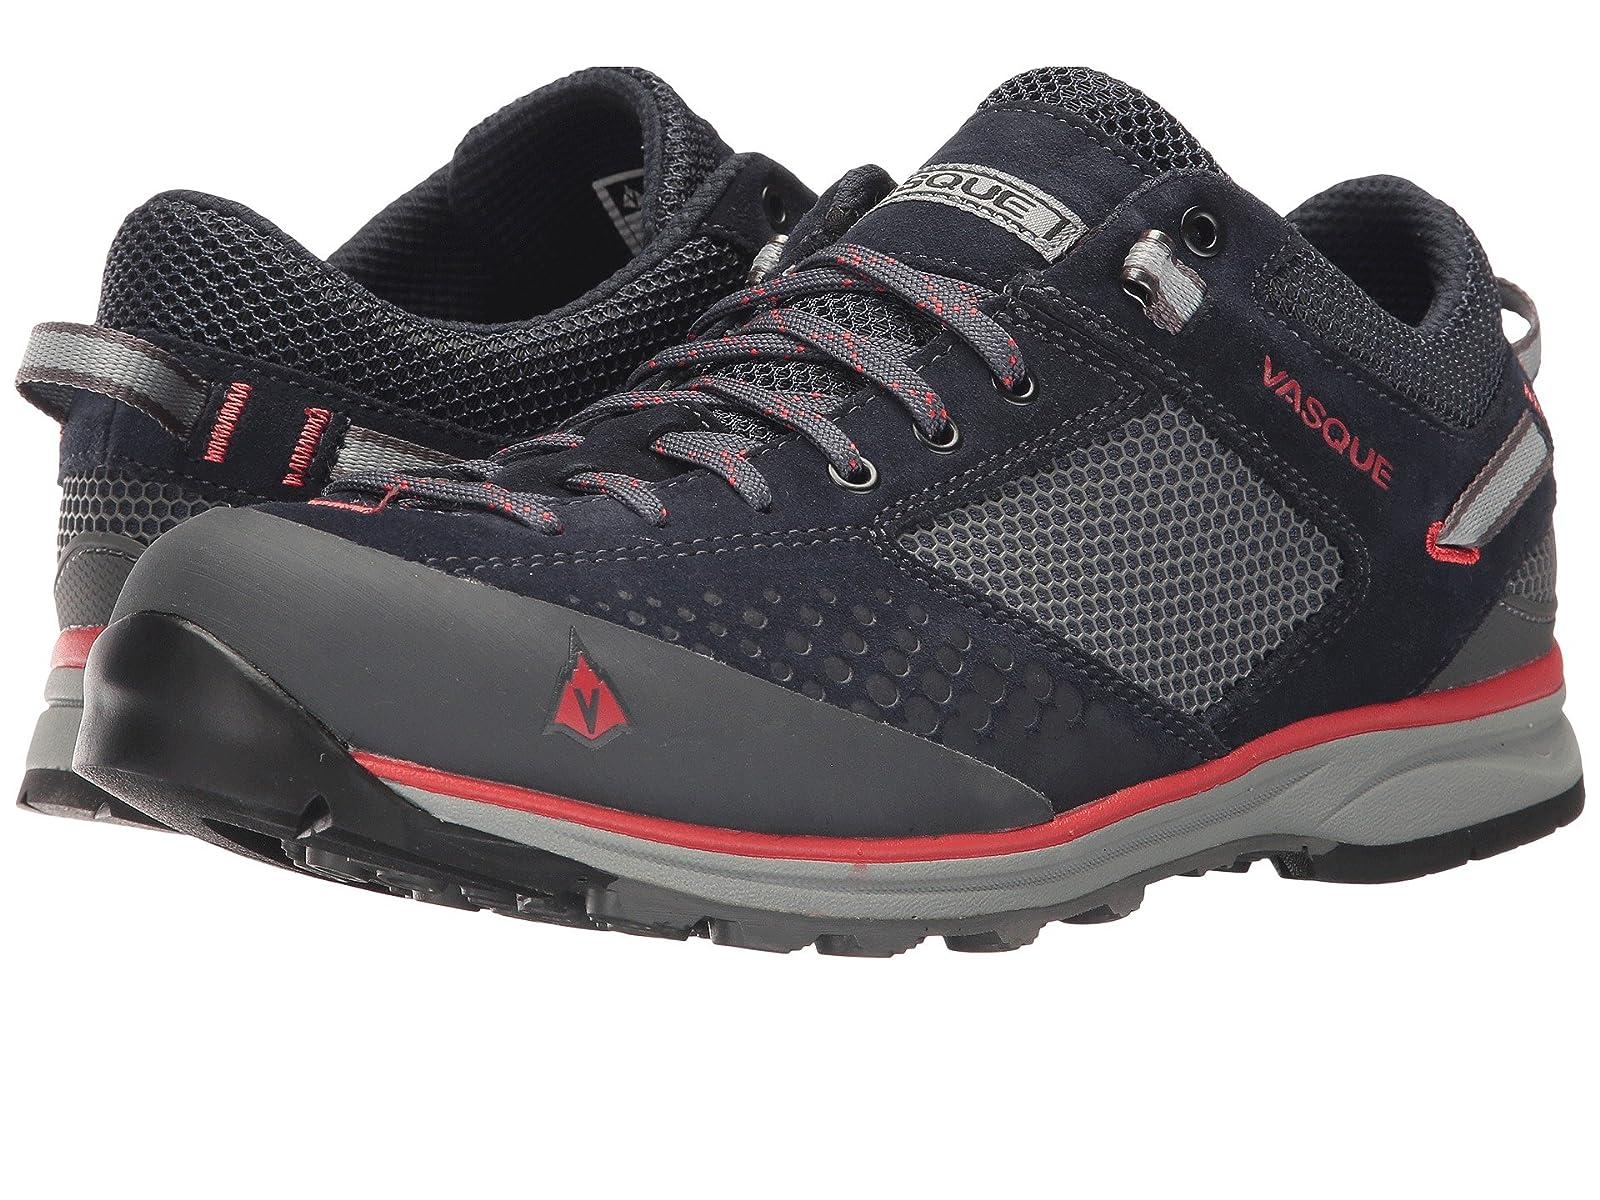 Vasque Grand TraverseAtmospheric grades have affordable shoes